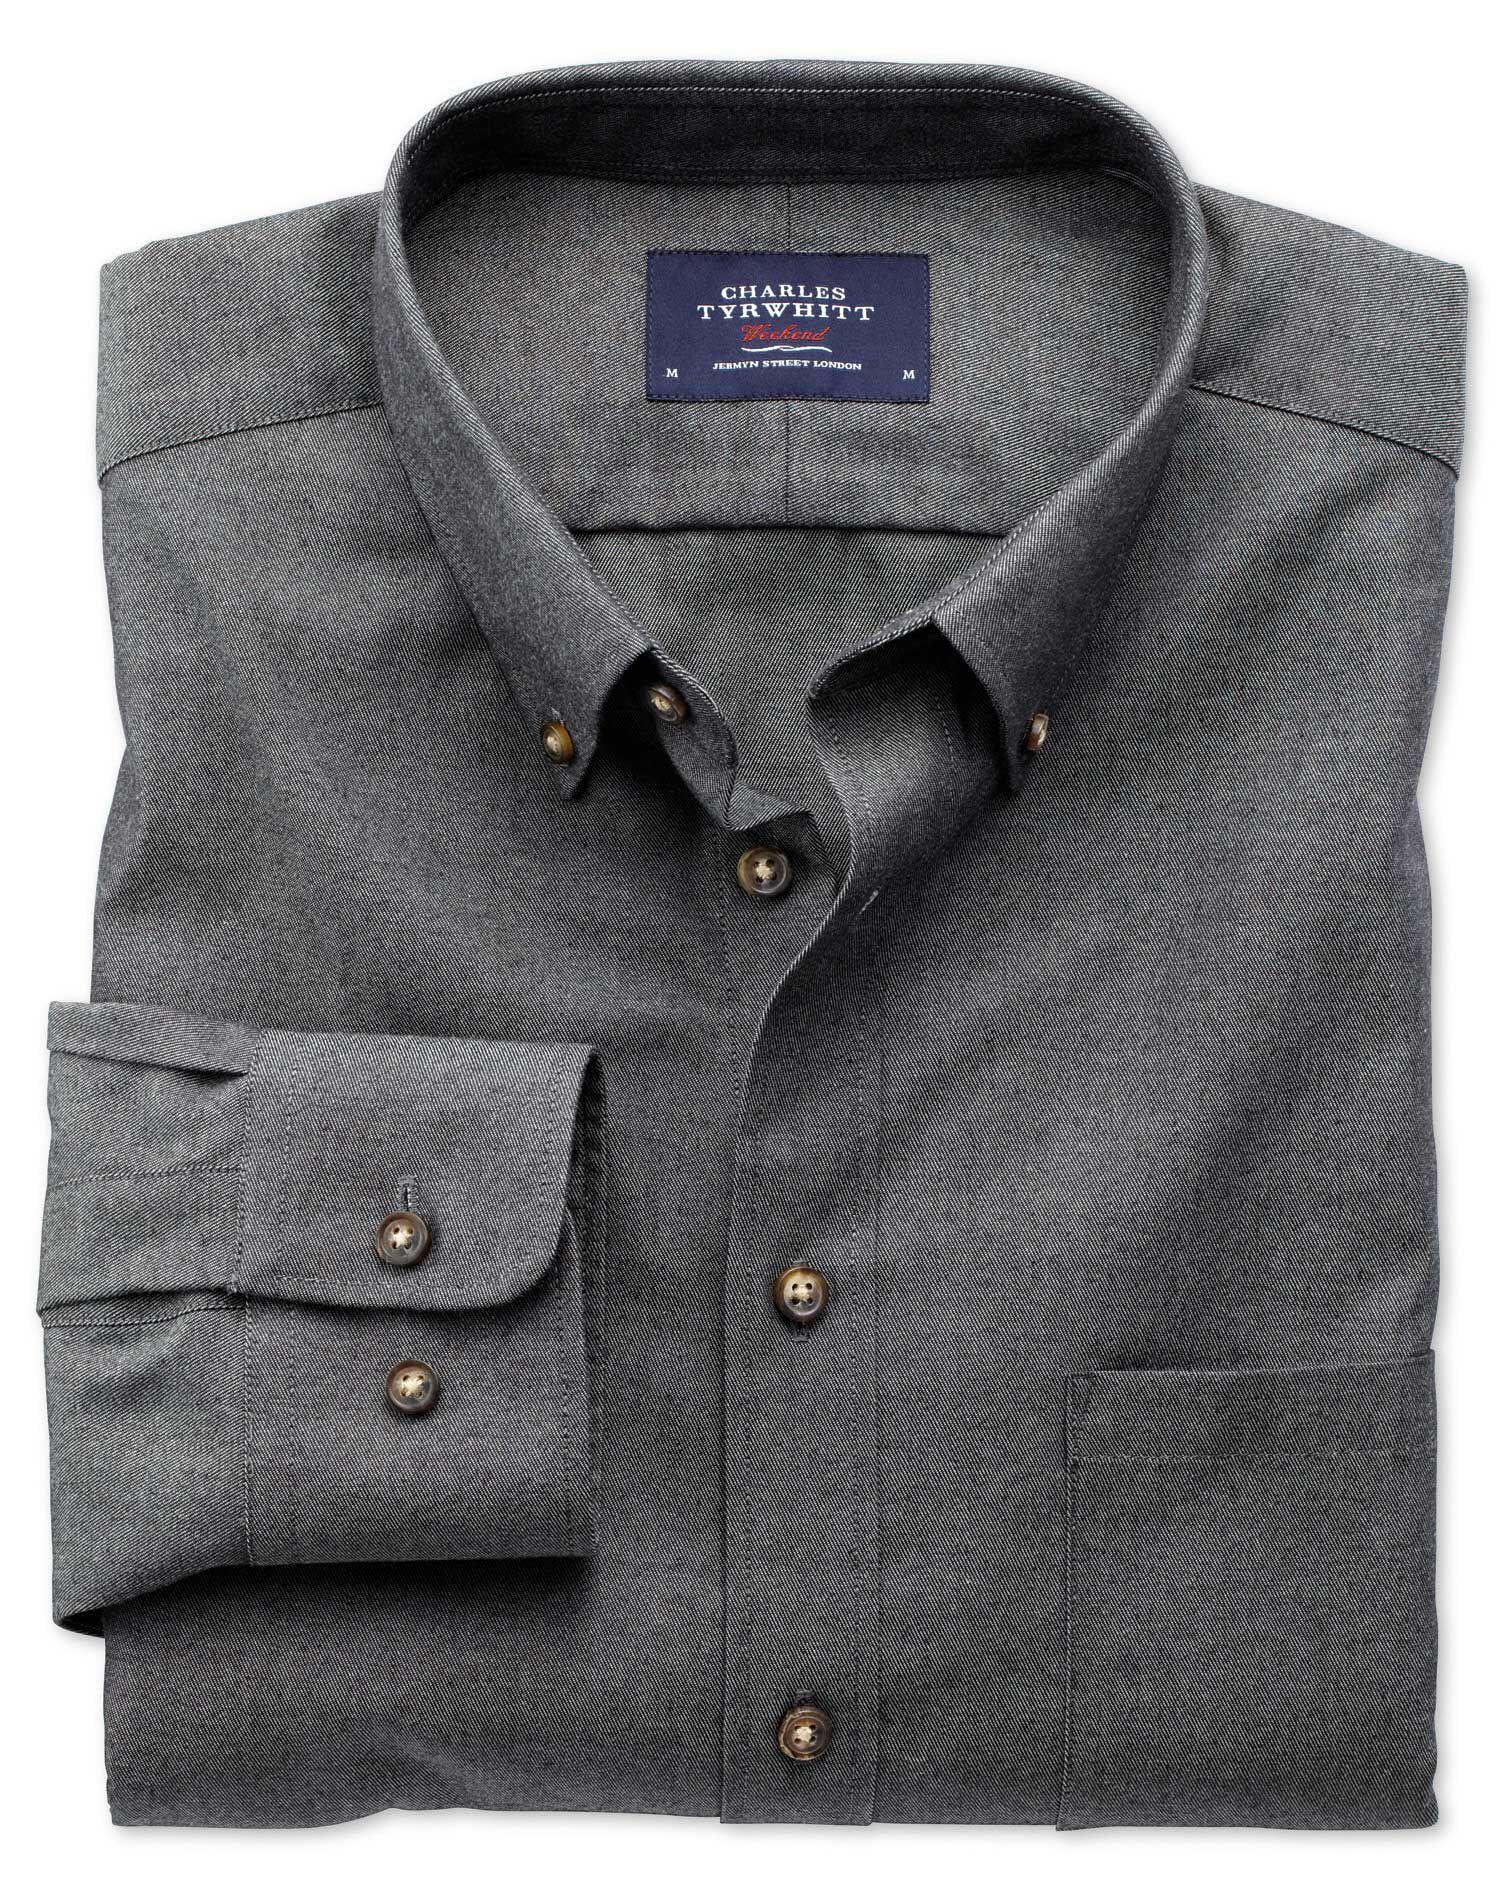 Extra Slim Fit Non-Iron Twill Dark Grey Cotton Shirt Single Cuff Size Large by Charles Tyrwhitt